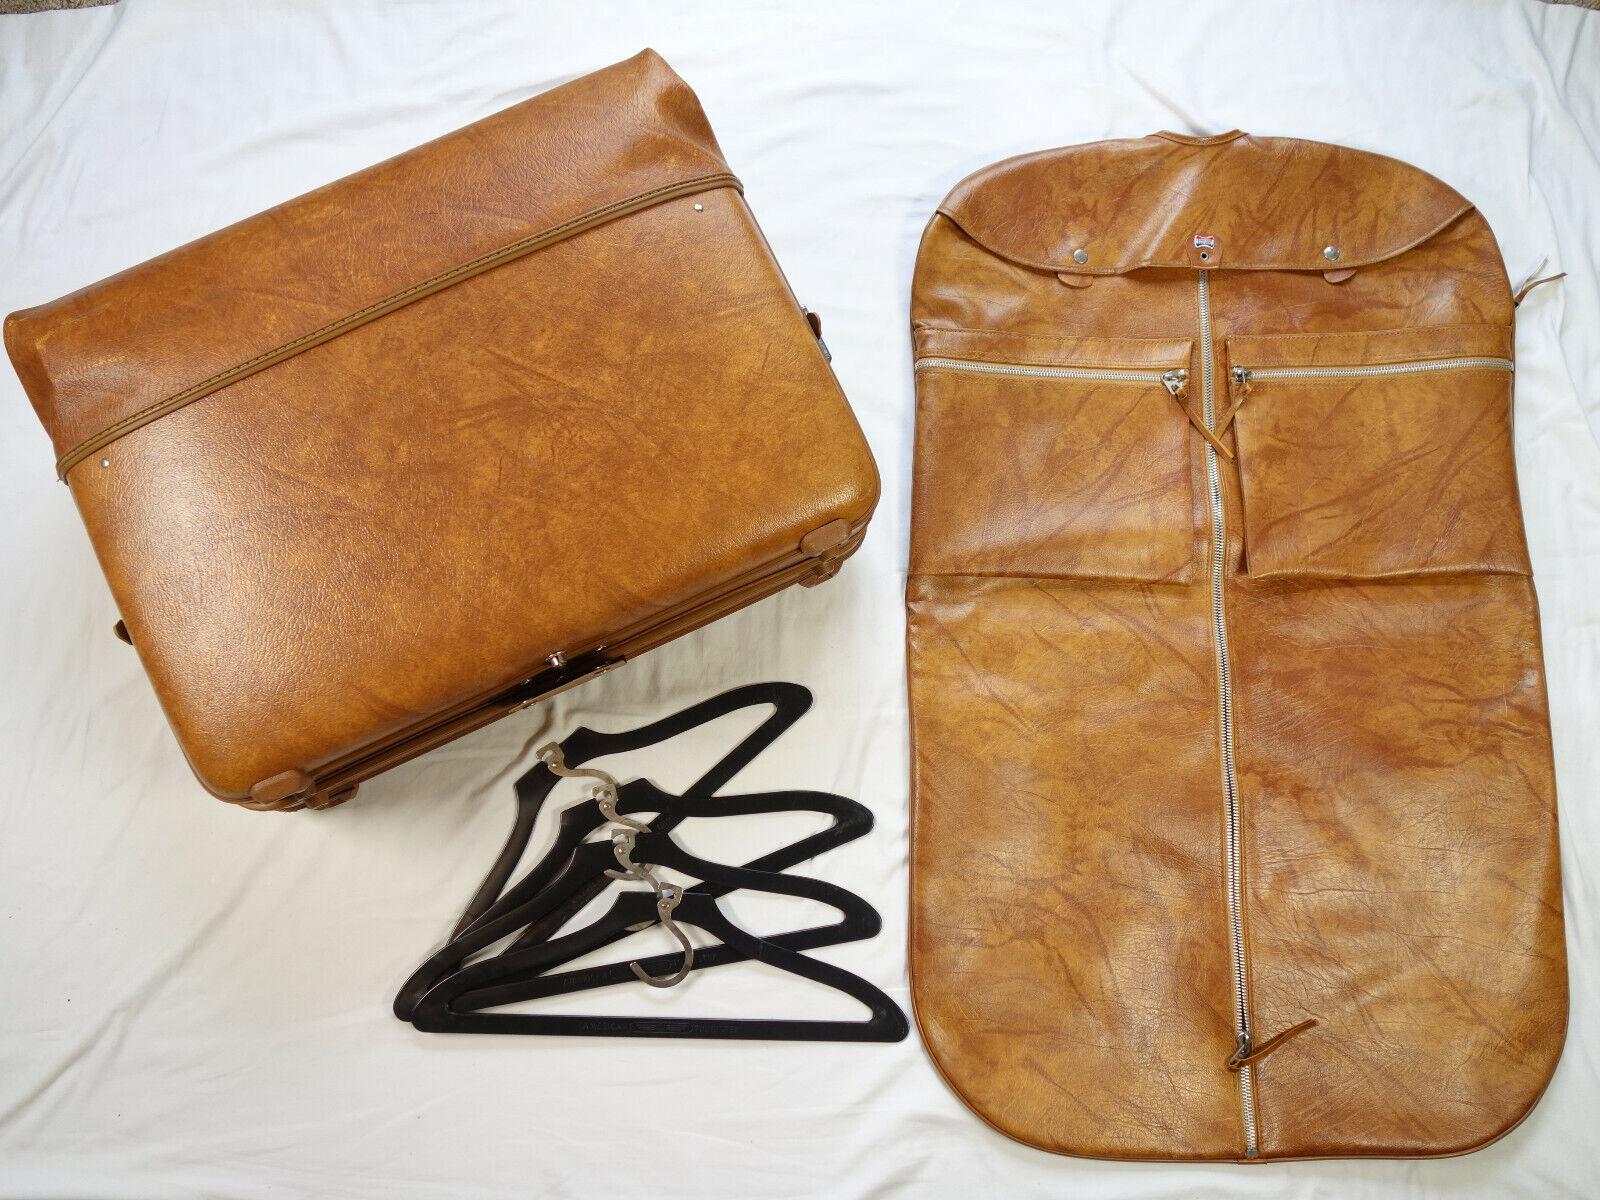 Vintage Retro American Tourister Escort Large Garment Carrier Bag Luggage Set  - $69.99